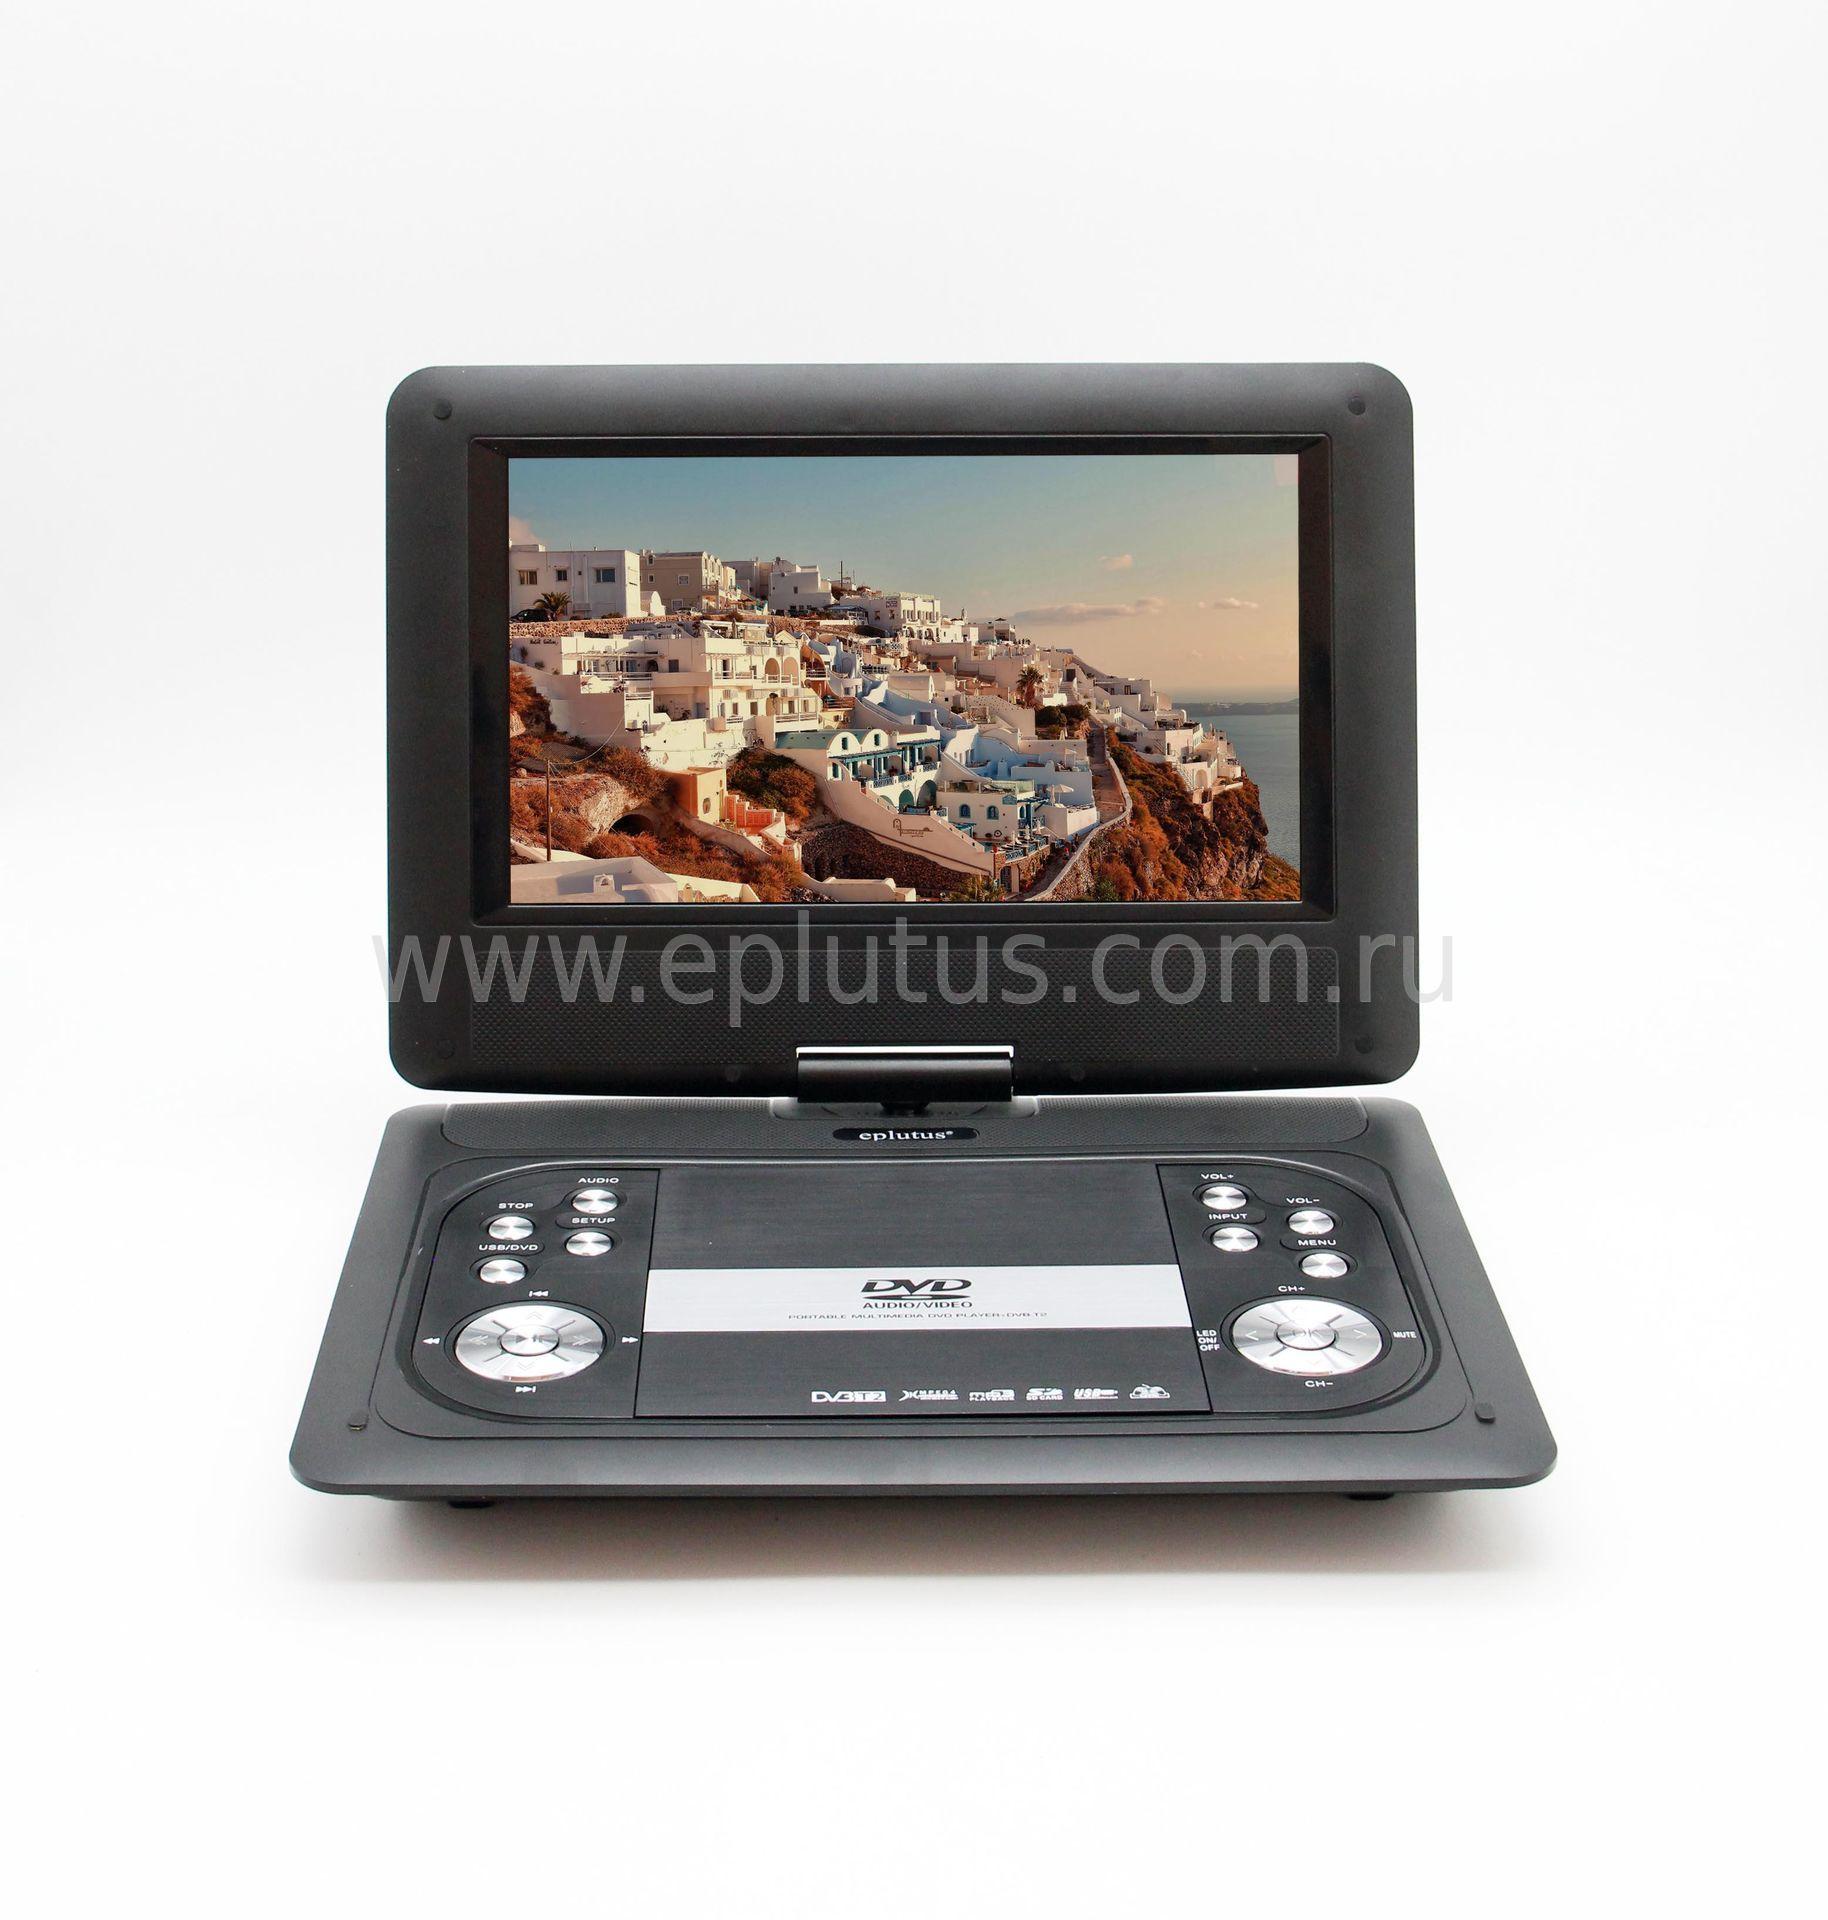 DVD-плеер Eplutus EP-1029T